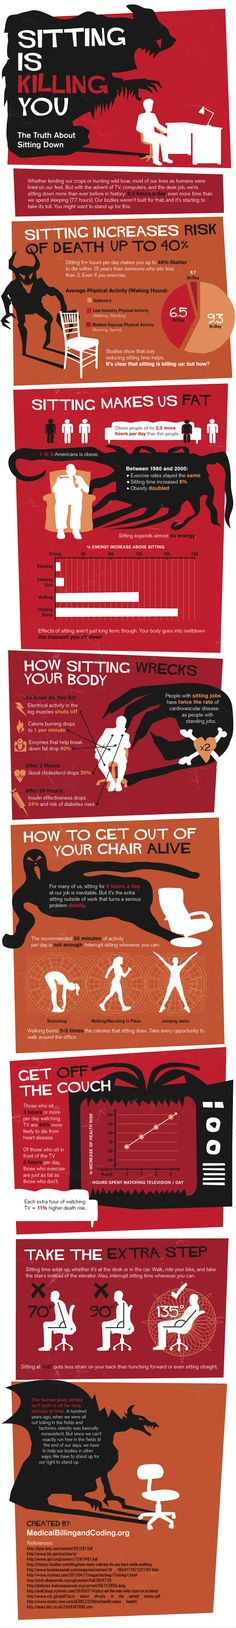 alcohol detox process | Health & Safety Infographics | Pinterest ...